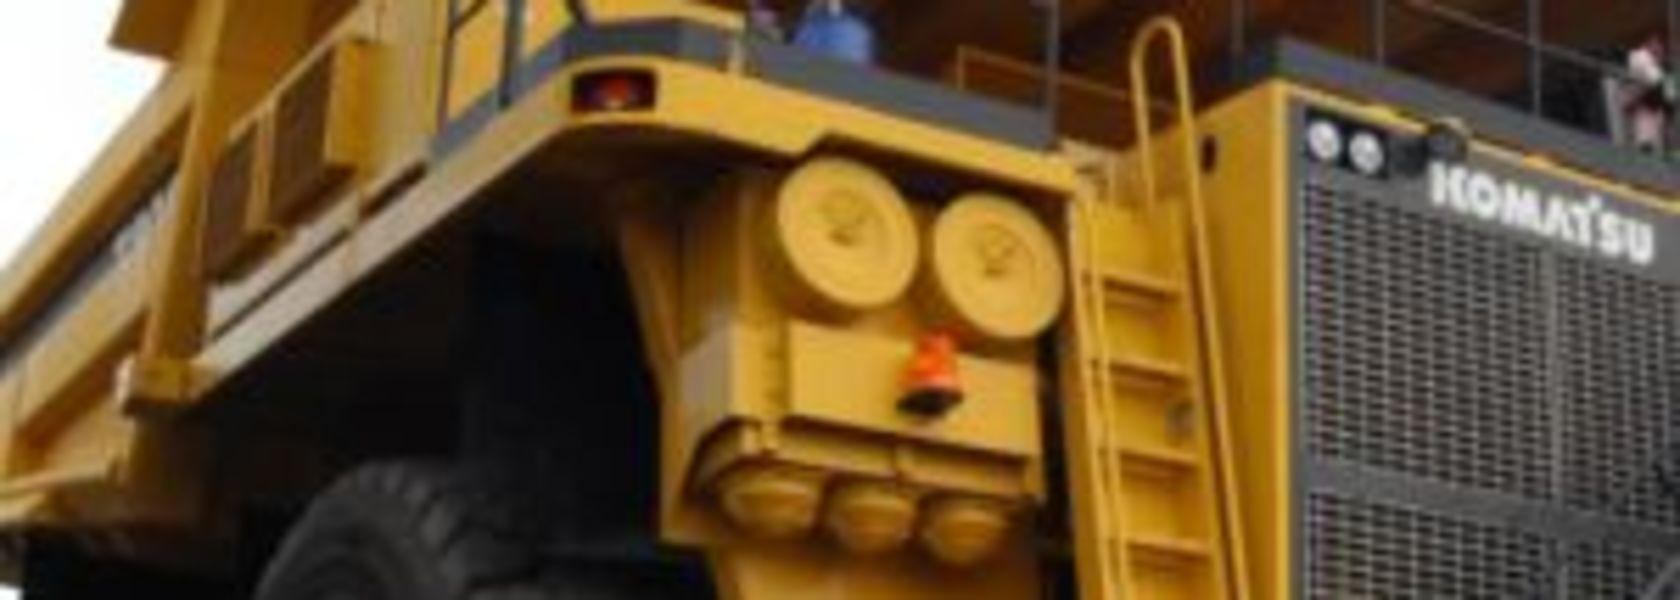 Contractor chooses Komatsu fleet - MiningNews net